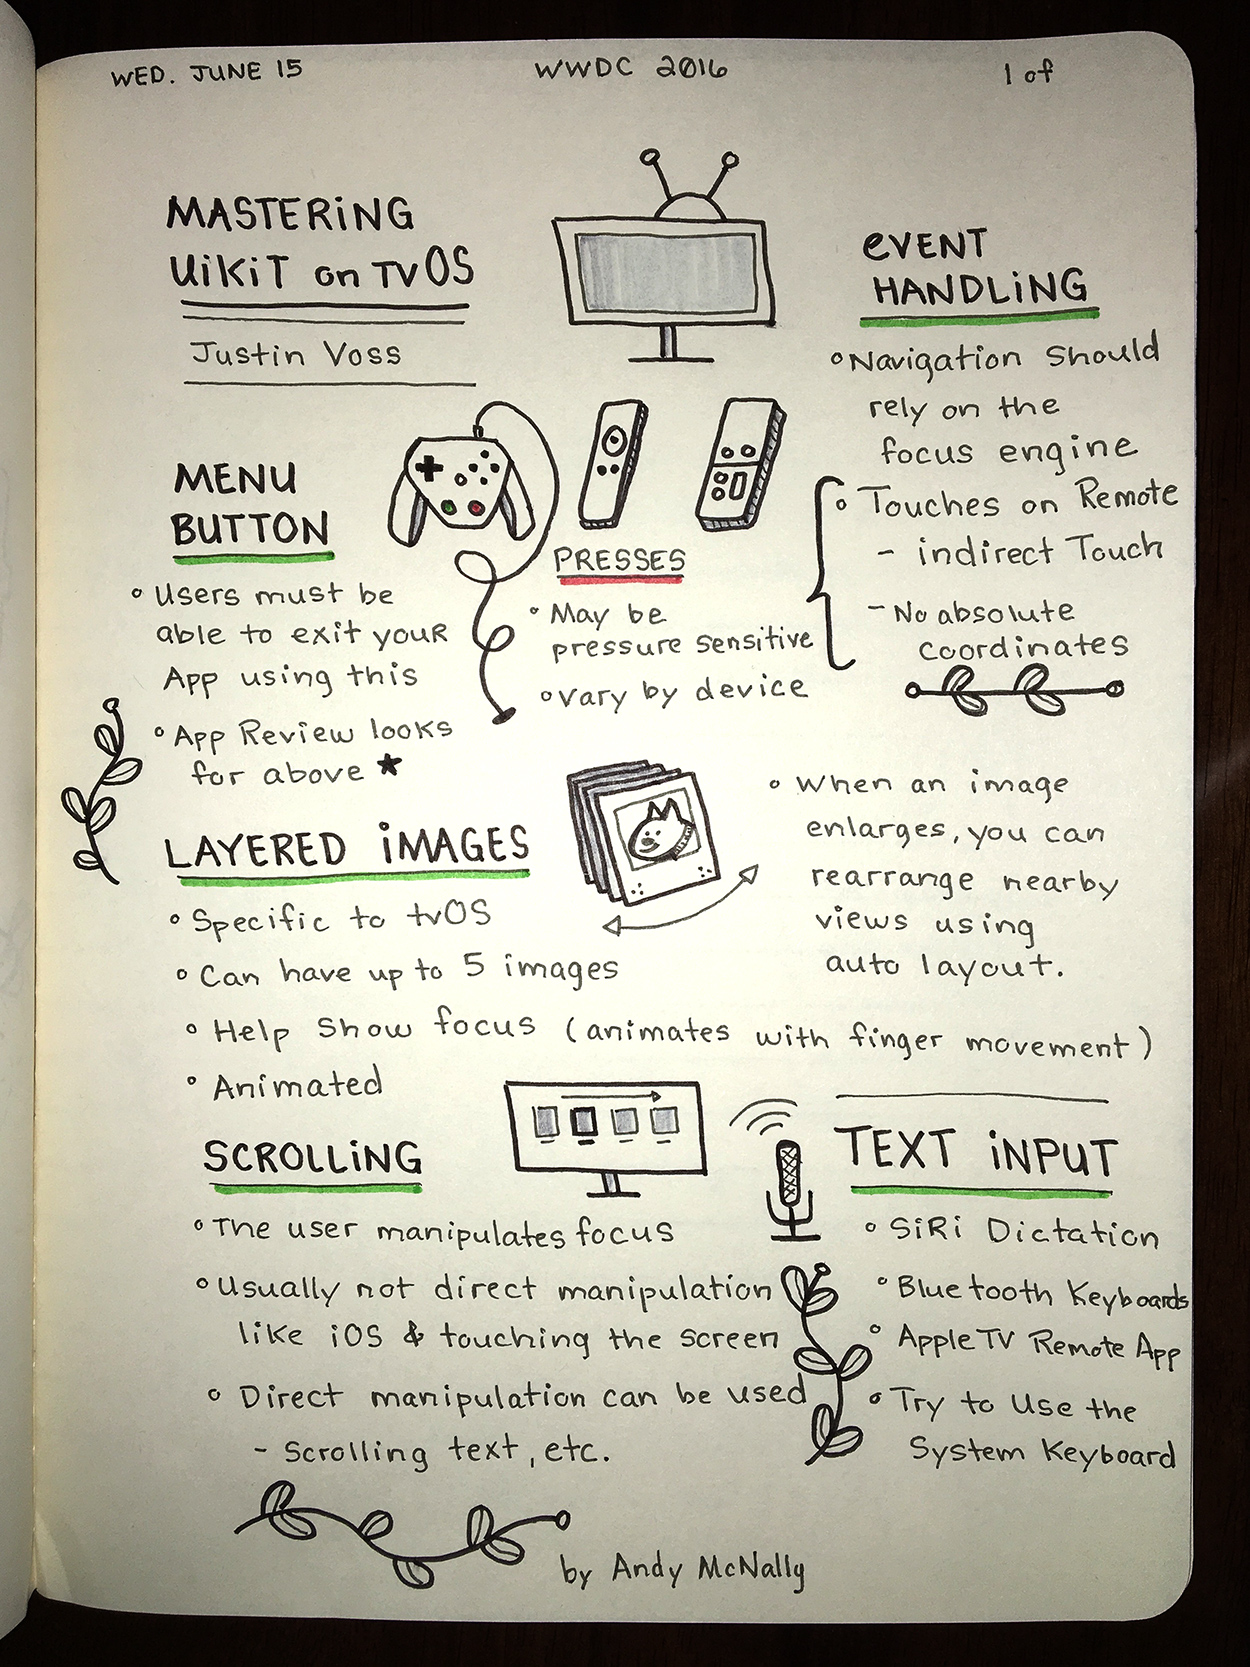 WWDC sketchnotes - Mastering UIKit